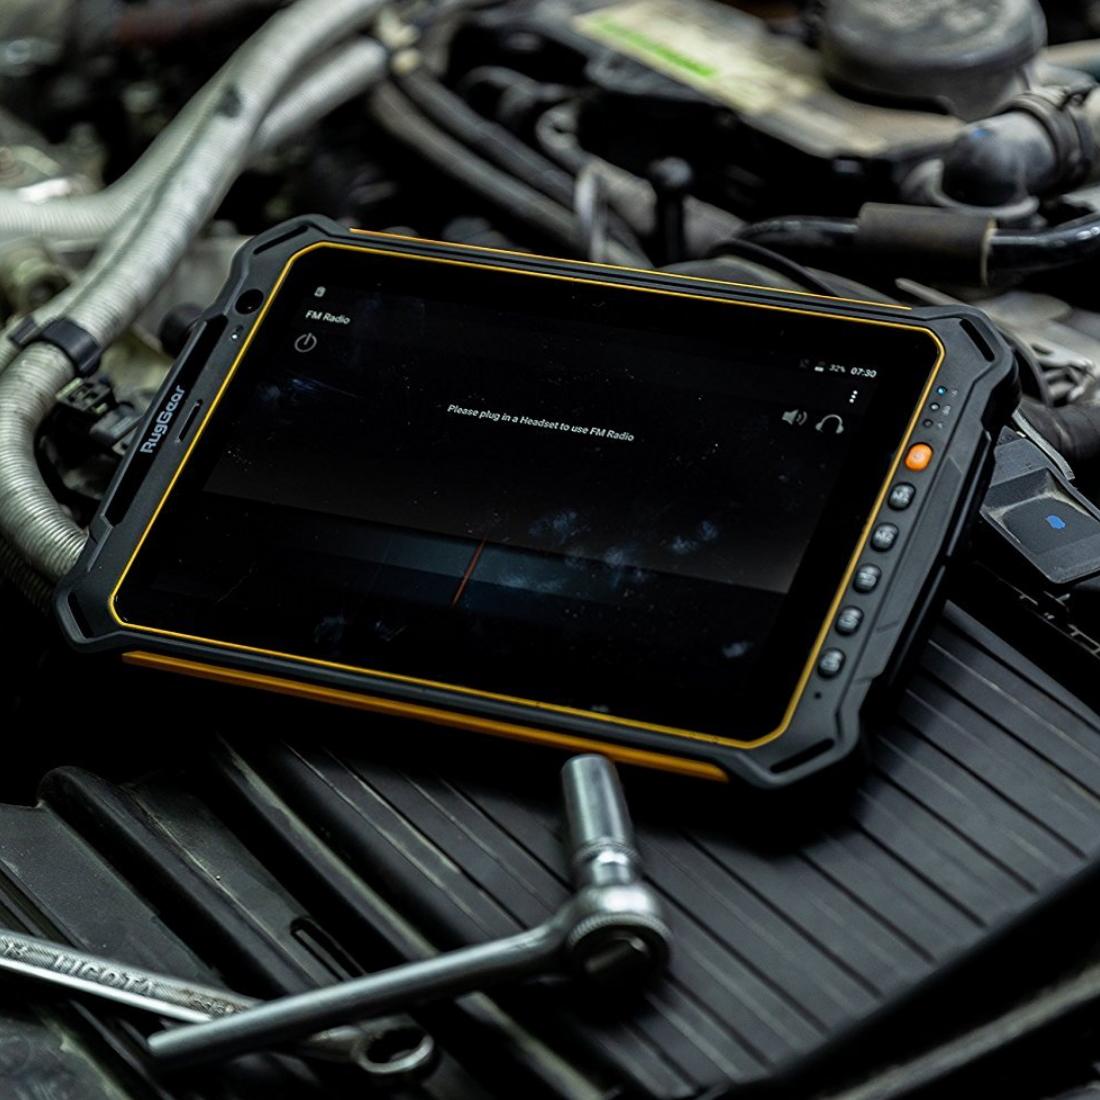 tableta ruggear rg910 80 32gb 3gb ram lte ip68 rg910 black 2